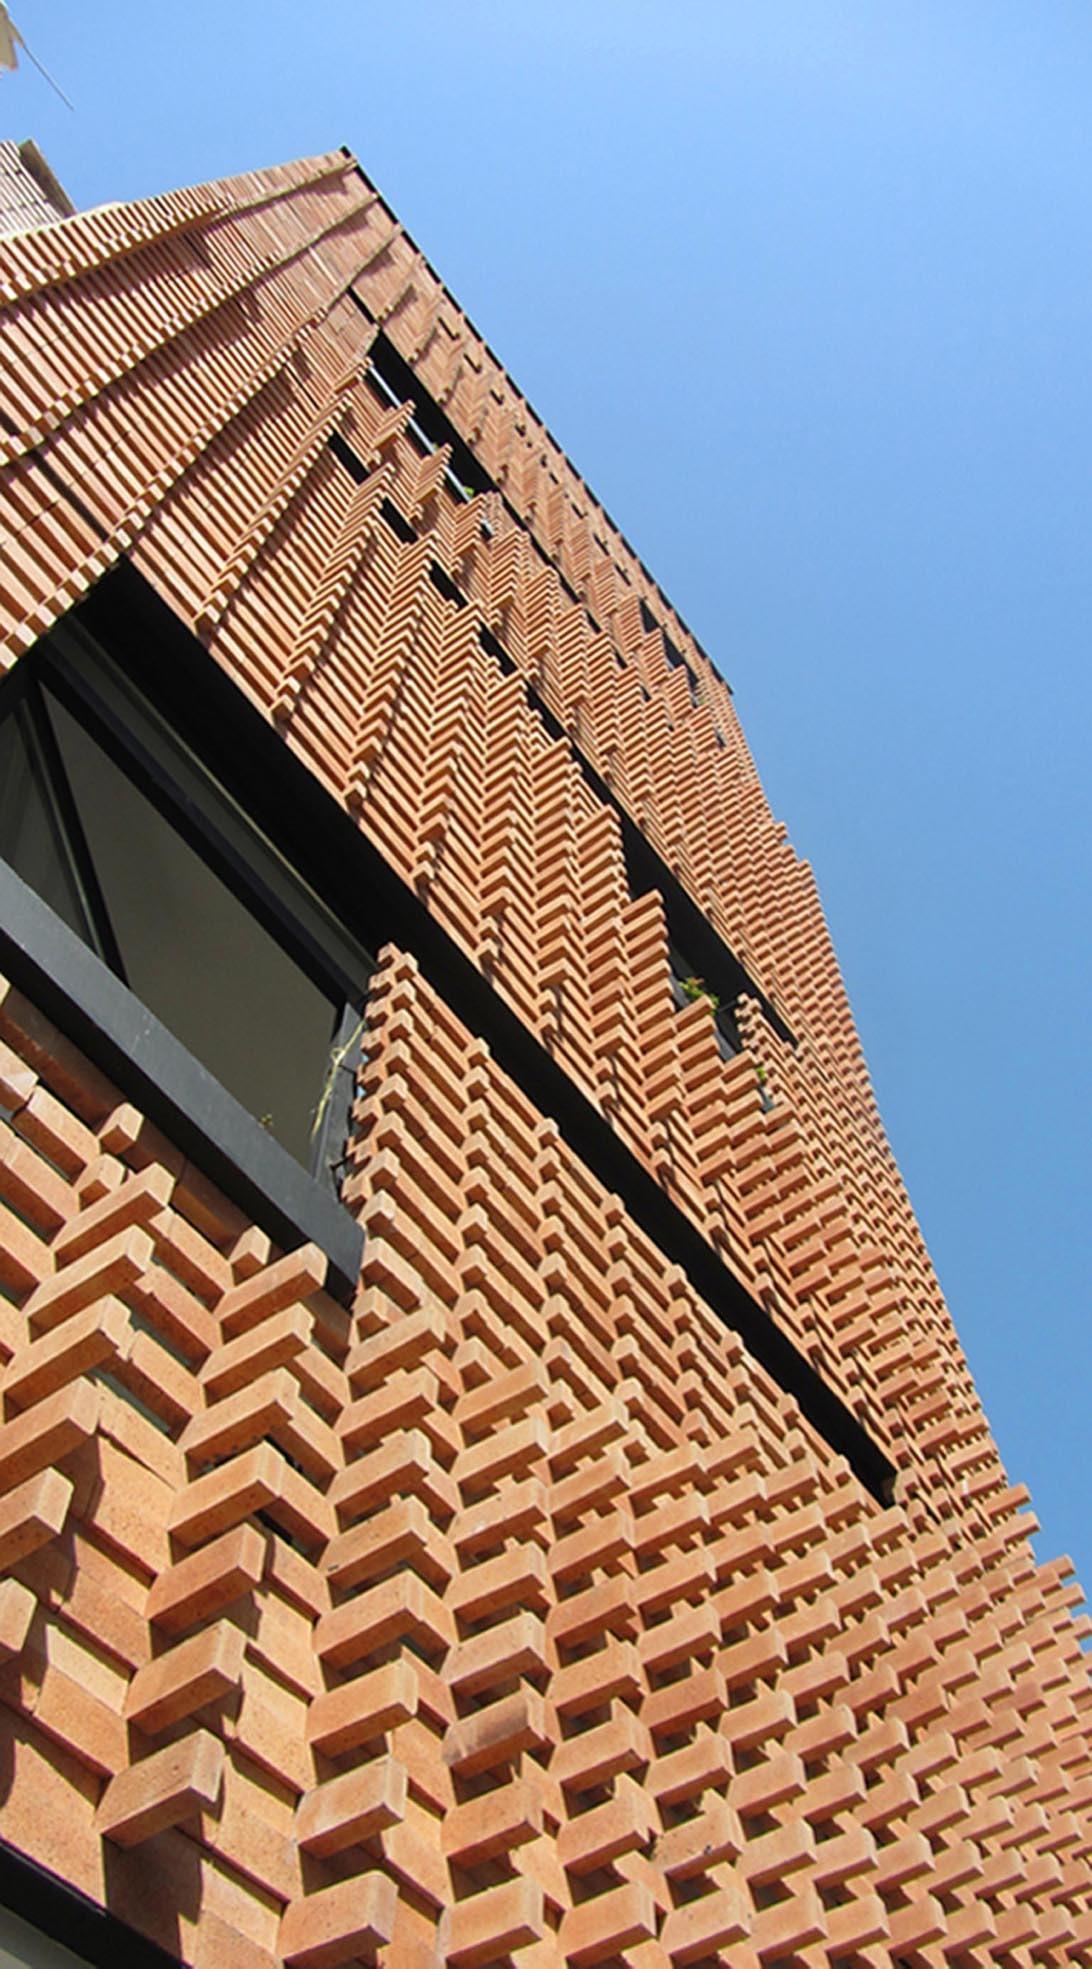 50b3d8b7b3fc4b0cf5000082 Brick Pattern House Alireza Mashhadmirza Image on Modern House Architecture Design